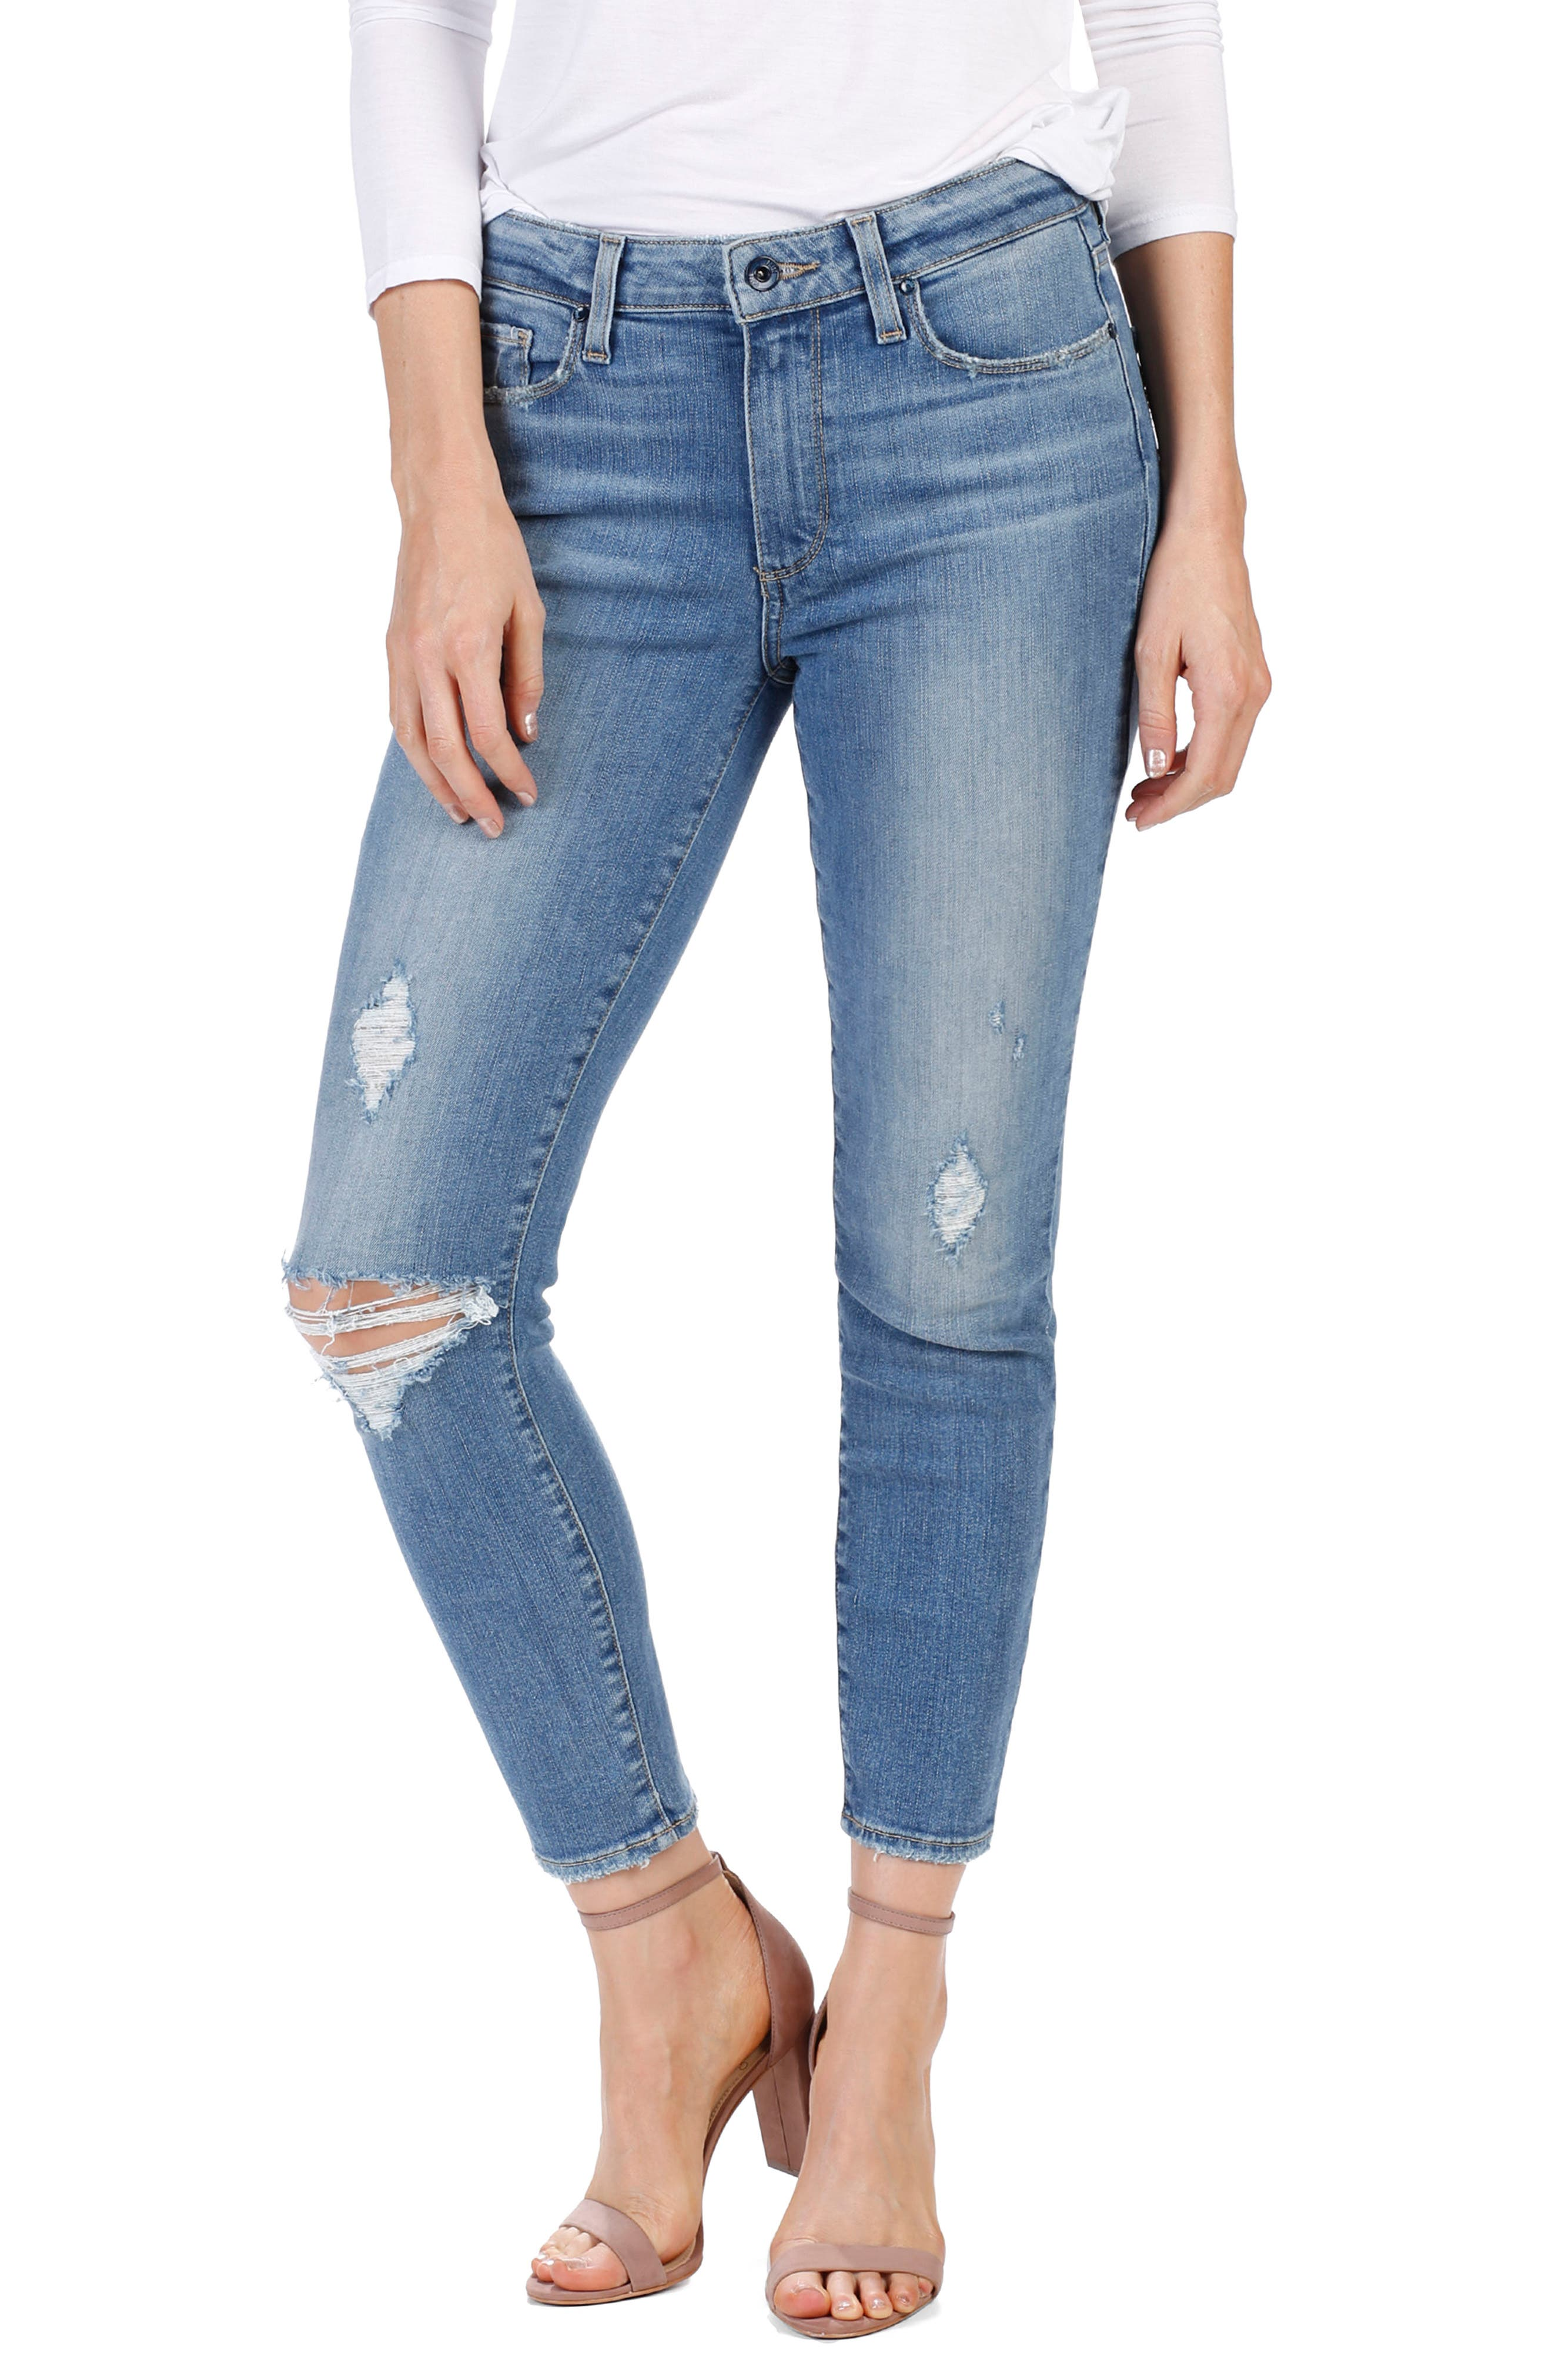 Transcend Vintage - Hoxton High Waist Crop Jeans,                         Main,                         color, Sienna Destructed